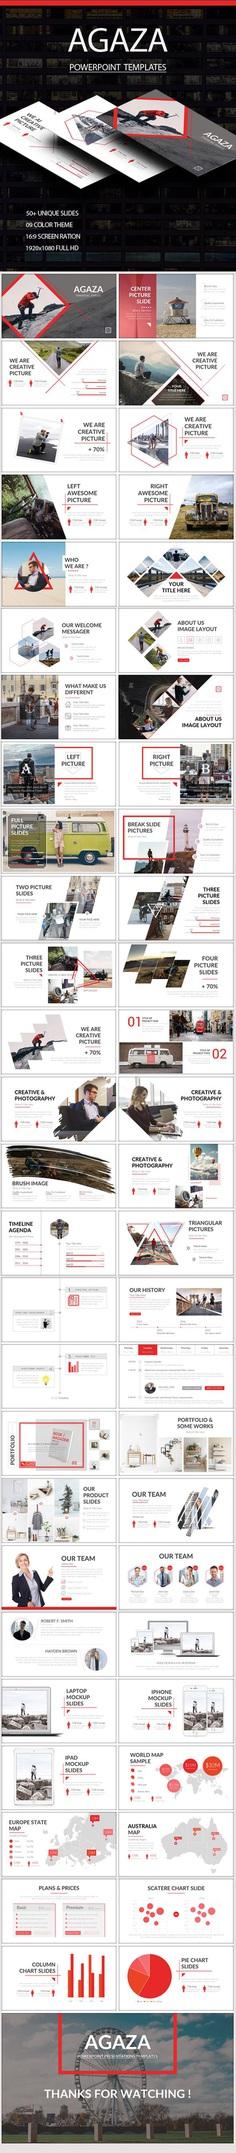 AGAZA PowerPoint Templates - PowerPoint Templates Presentation Templates